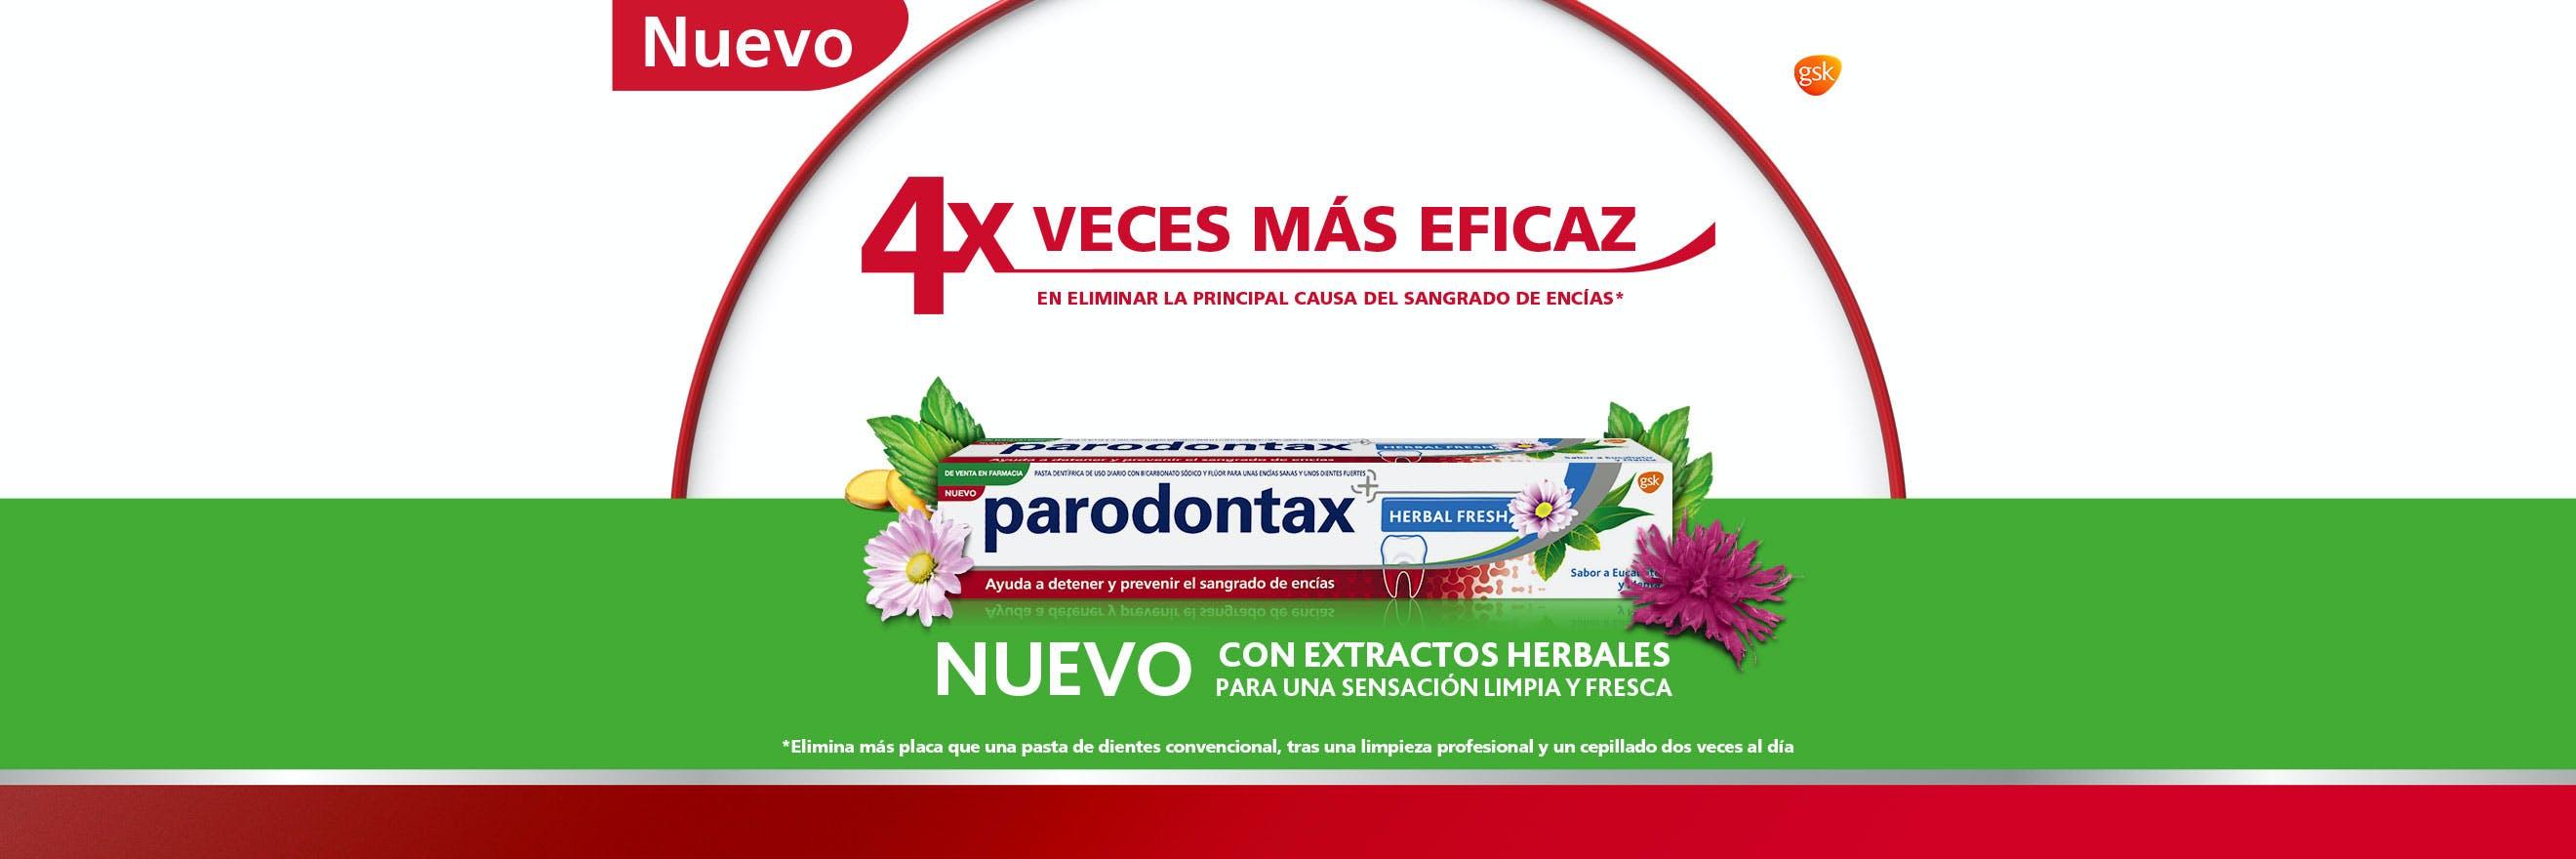 parodontax pasta de dientes Extra Fresh de uso diario